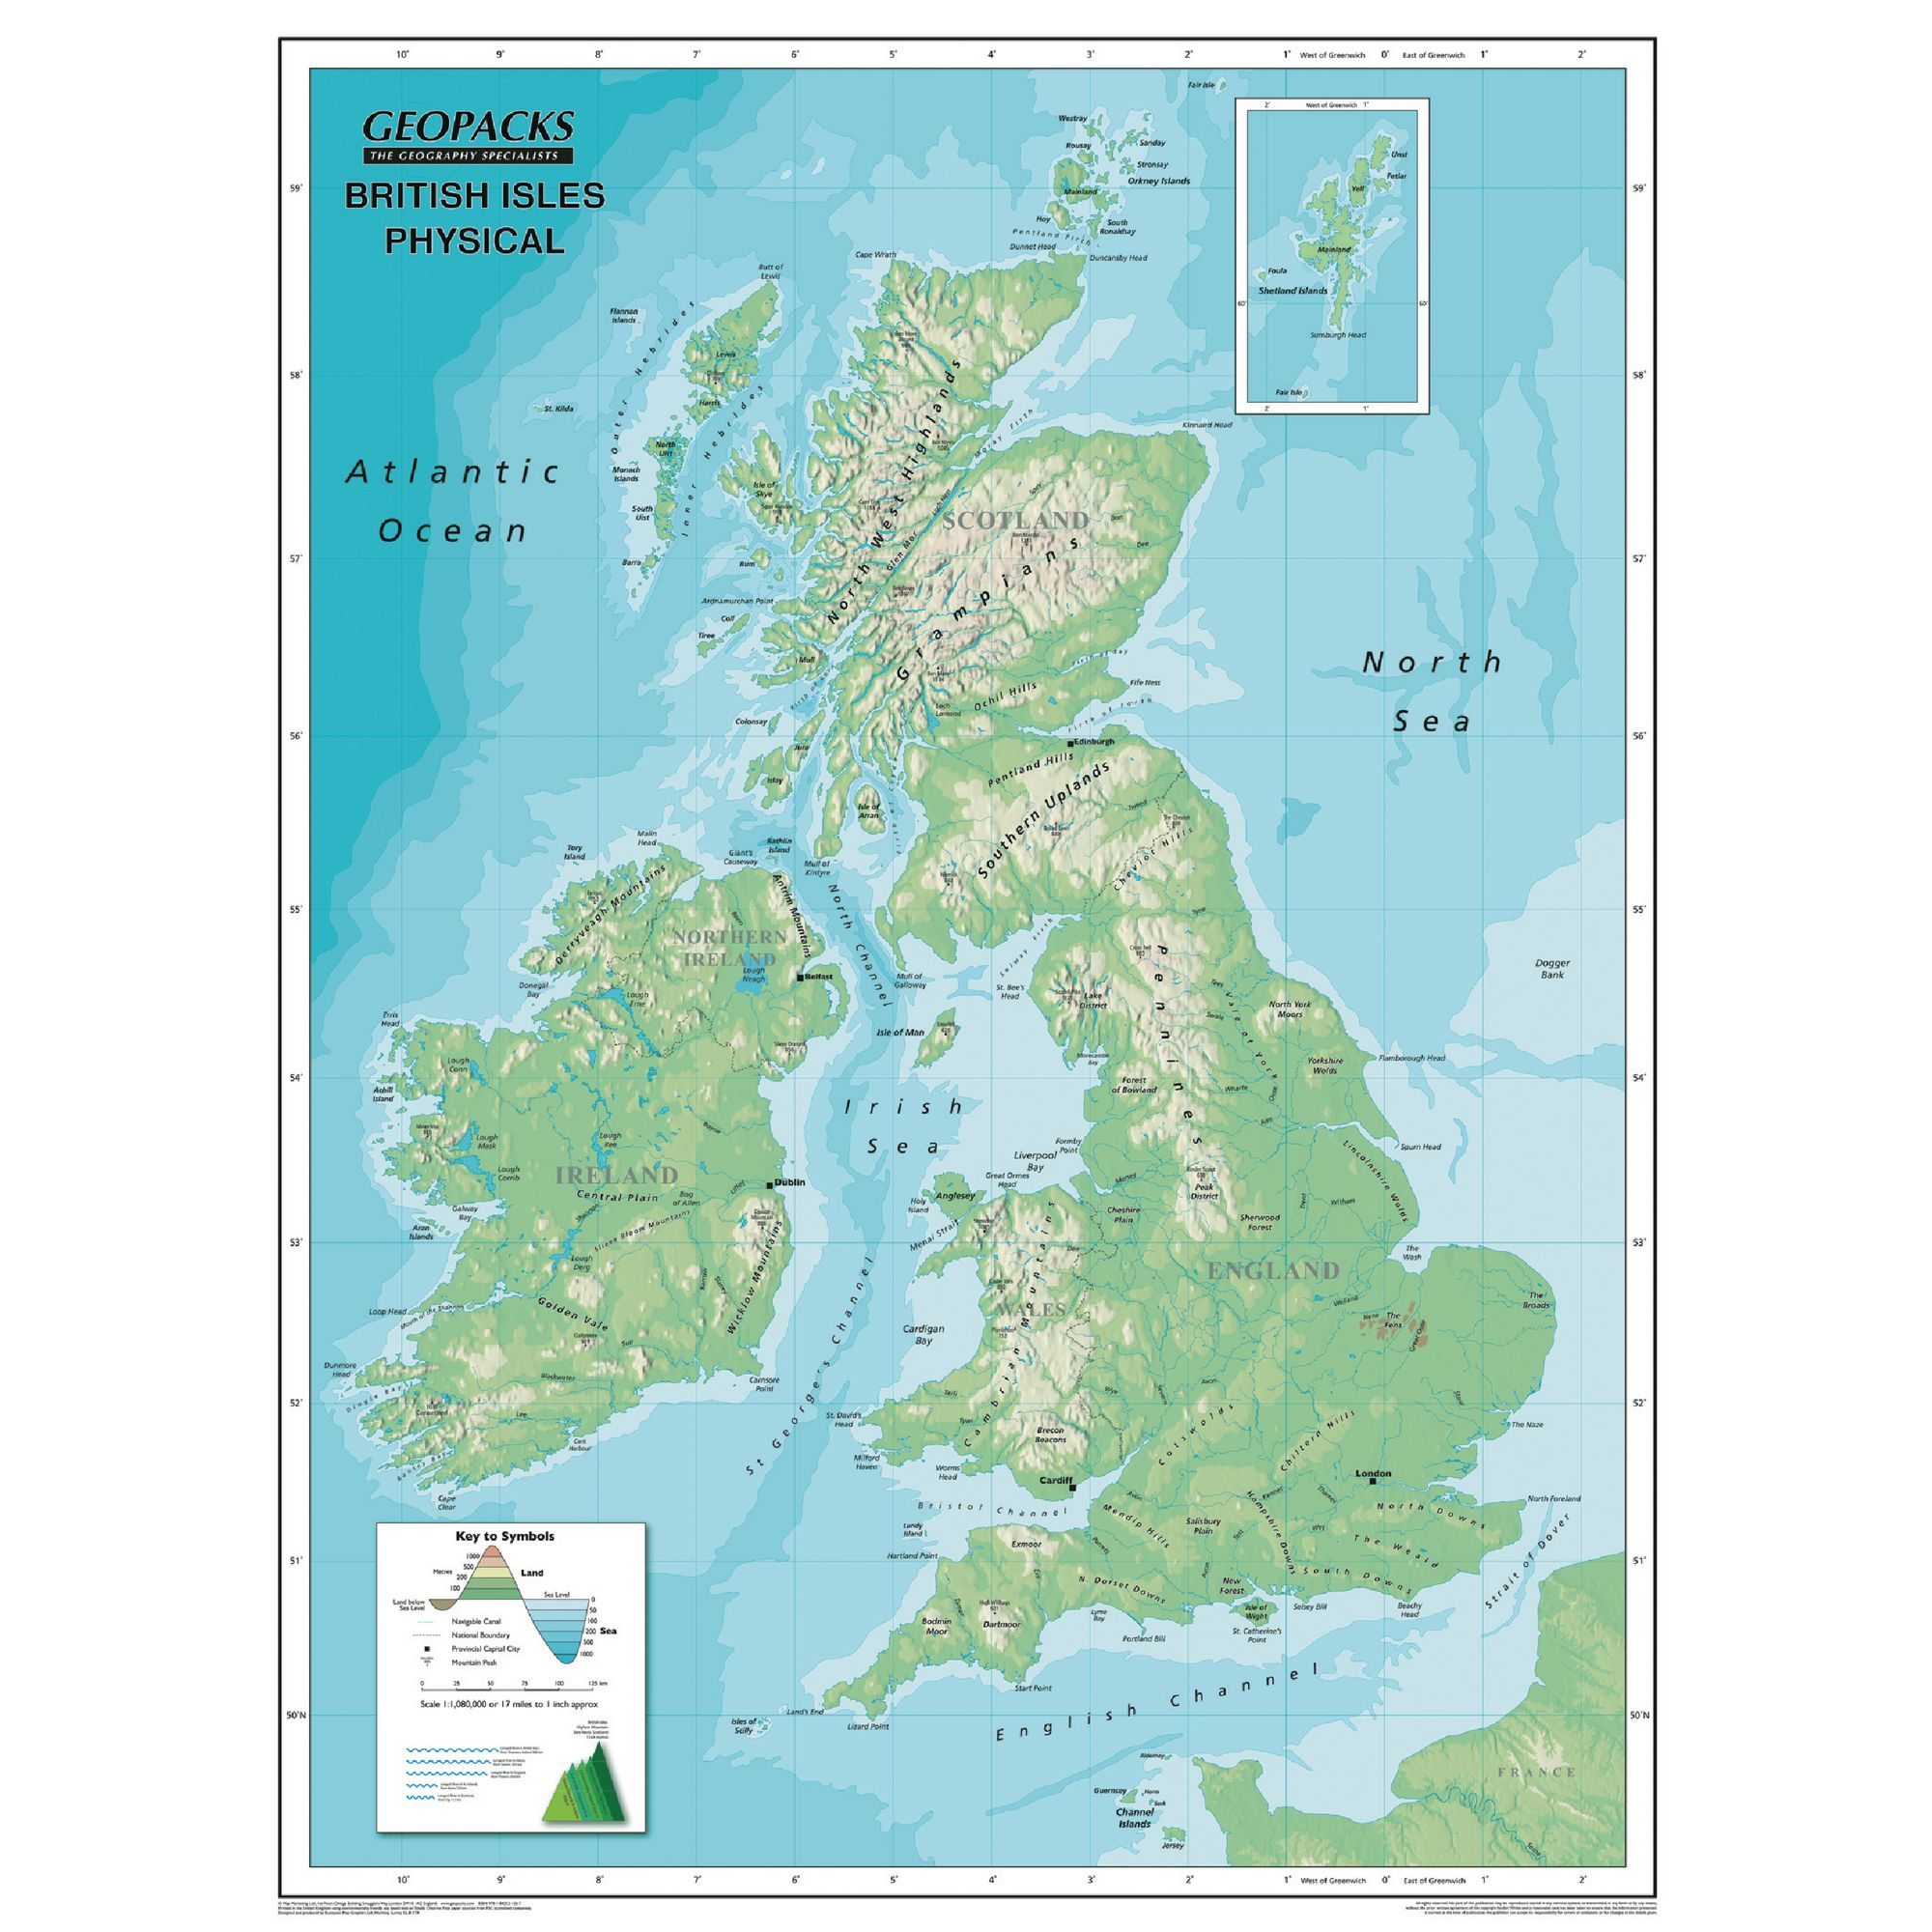 Reversible Map of the British Isles